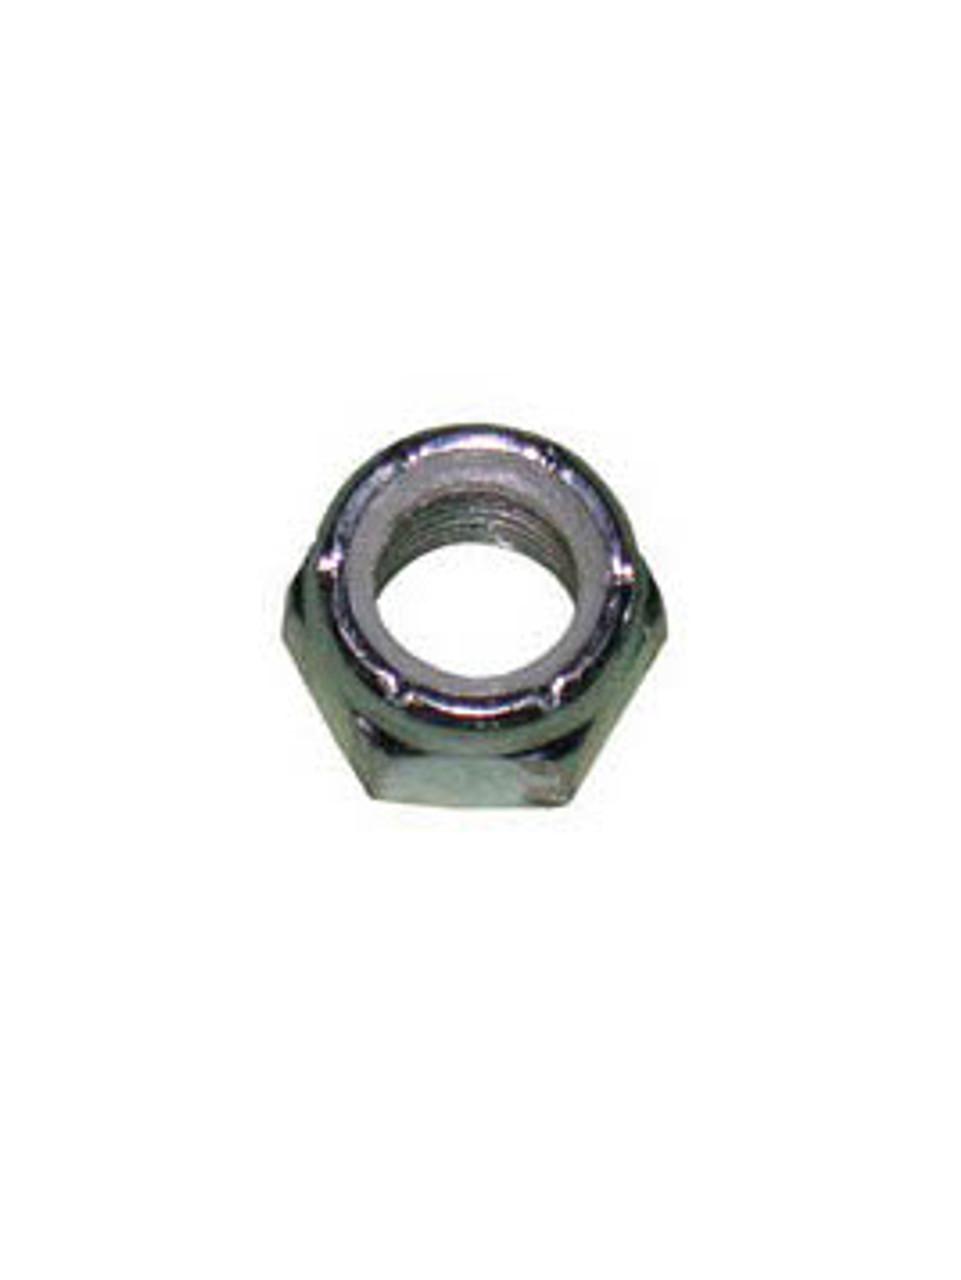 2031 --- Hydro-Act Brake Actuator Lock Nut